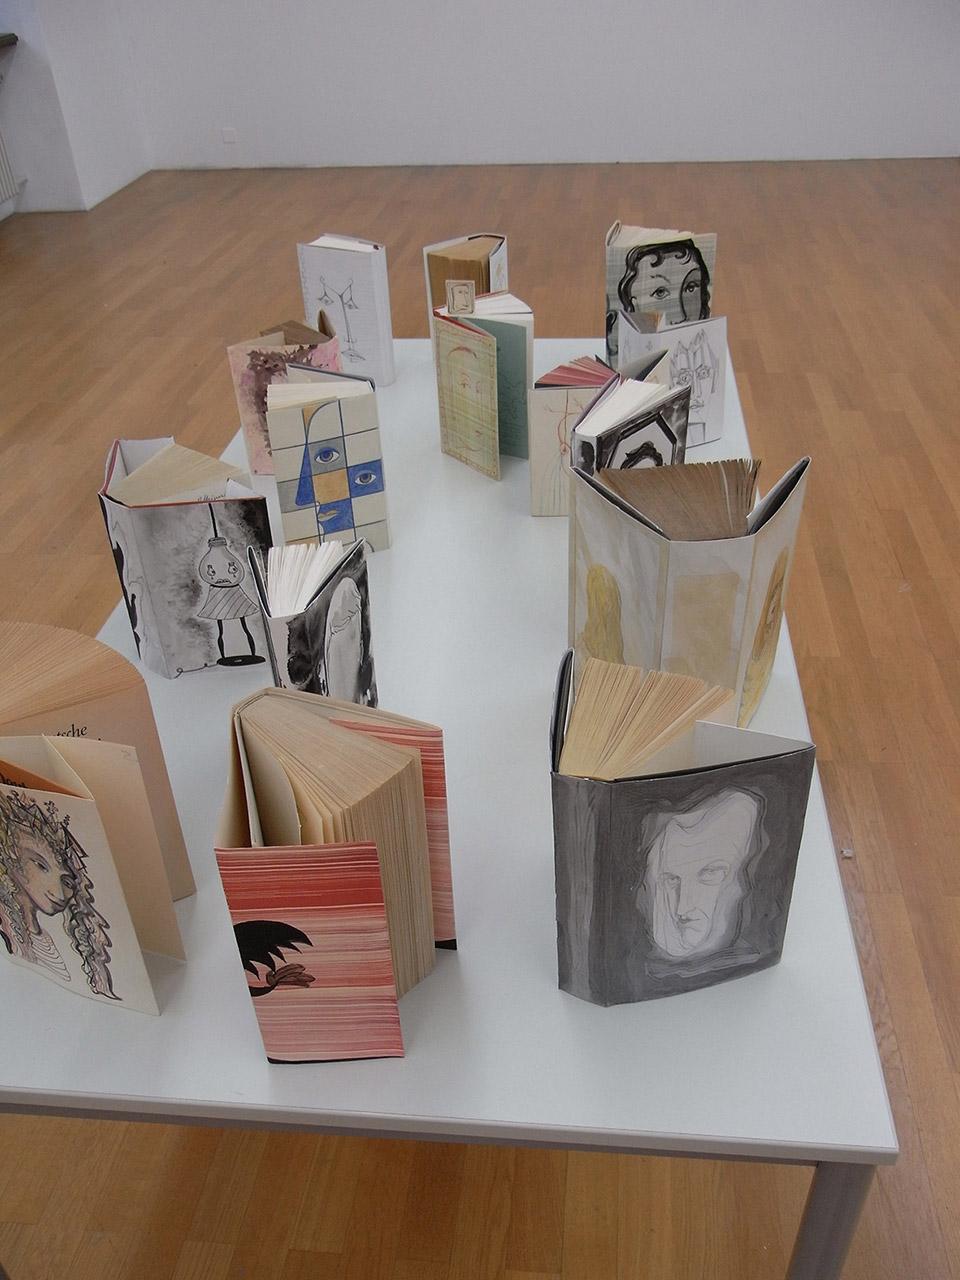 Dezember-Ausstellung-Kunsthalle-Winterthur-2009-2.jpg